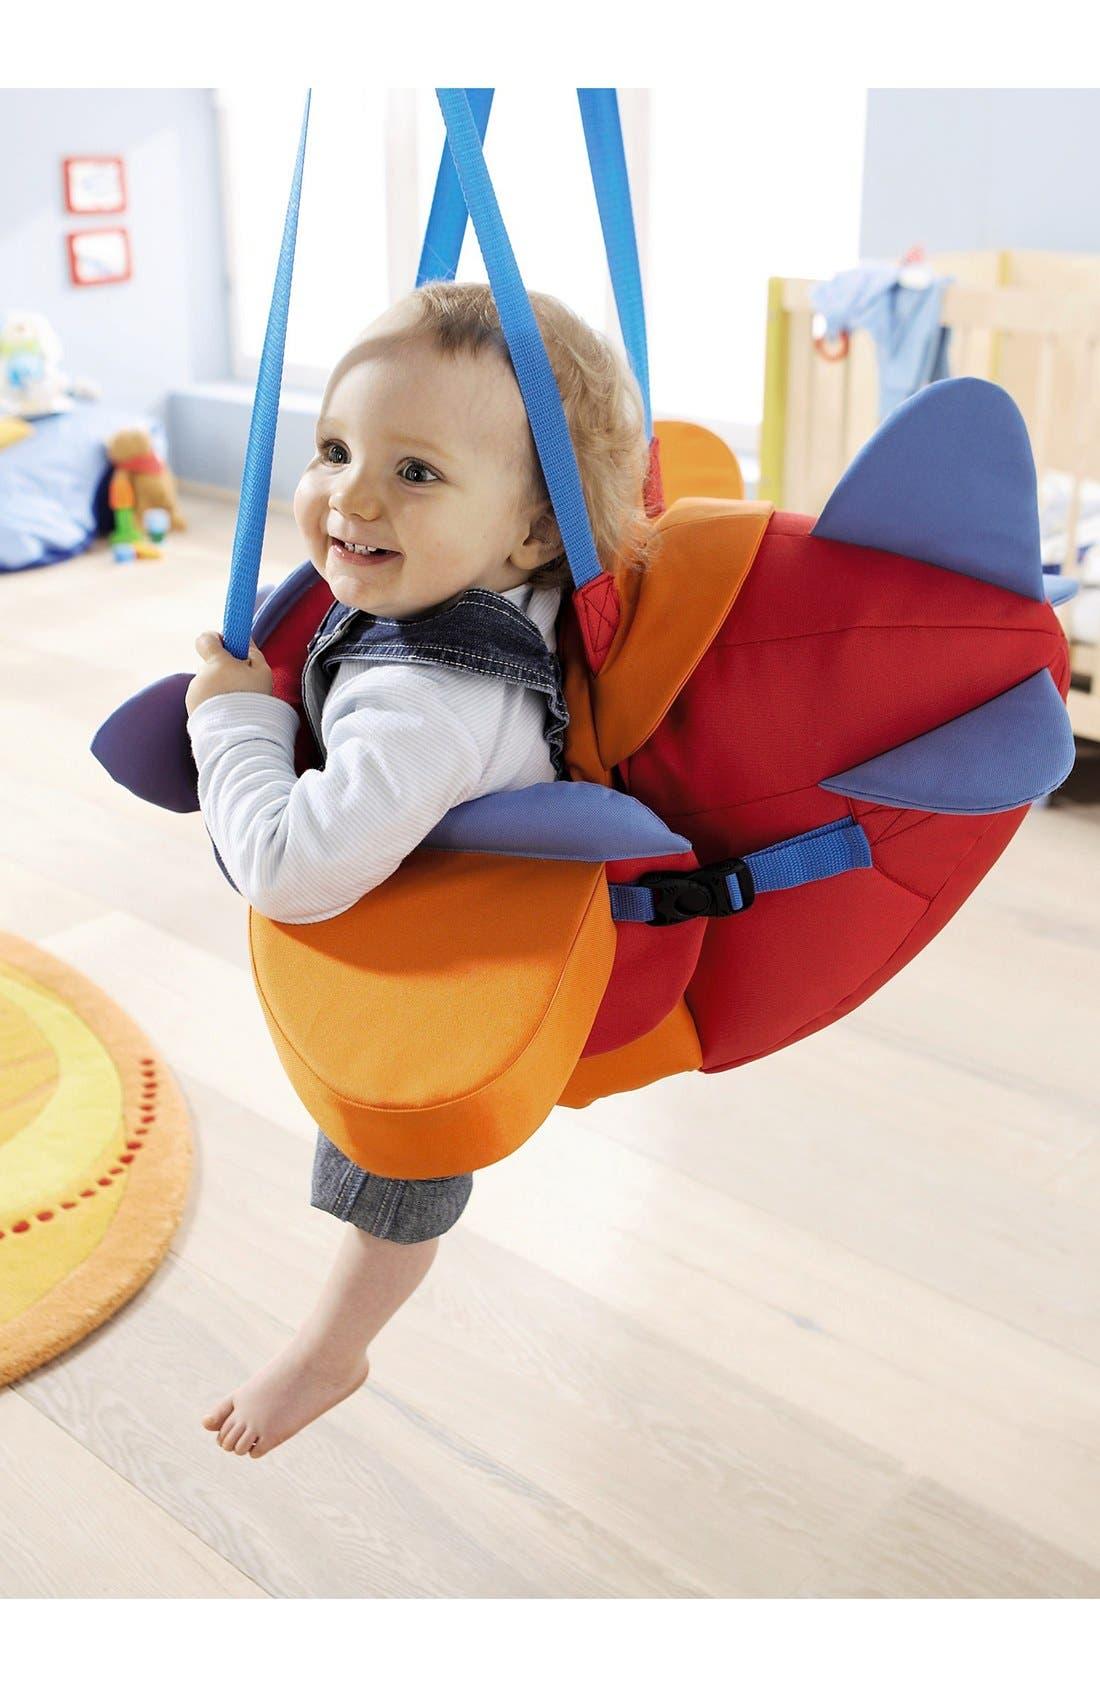 Alternate Image 3  - HABA Aircraft Baby Swing